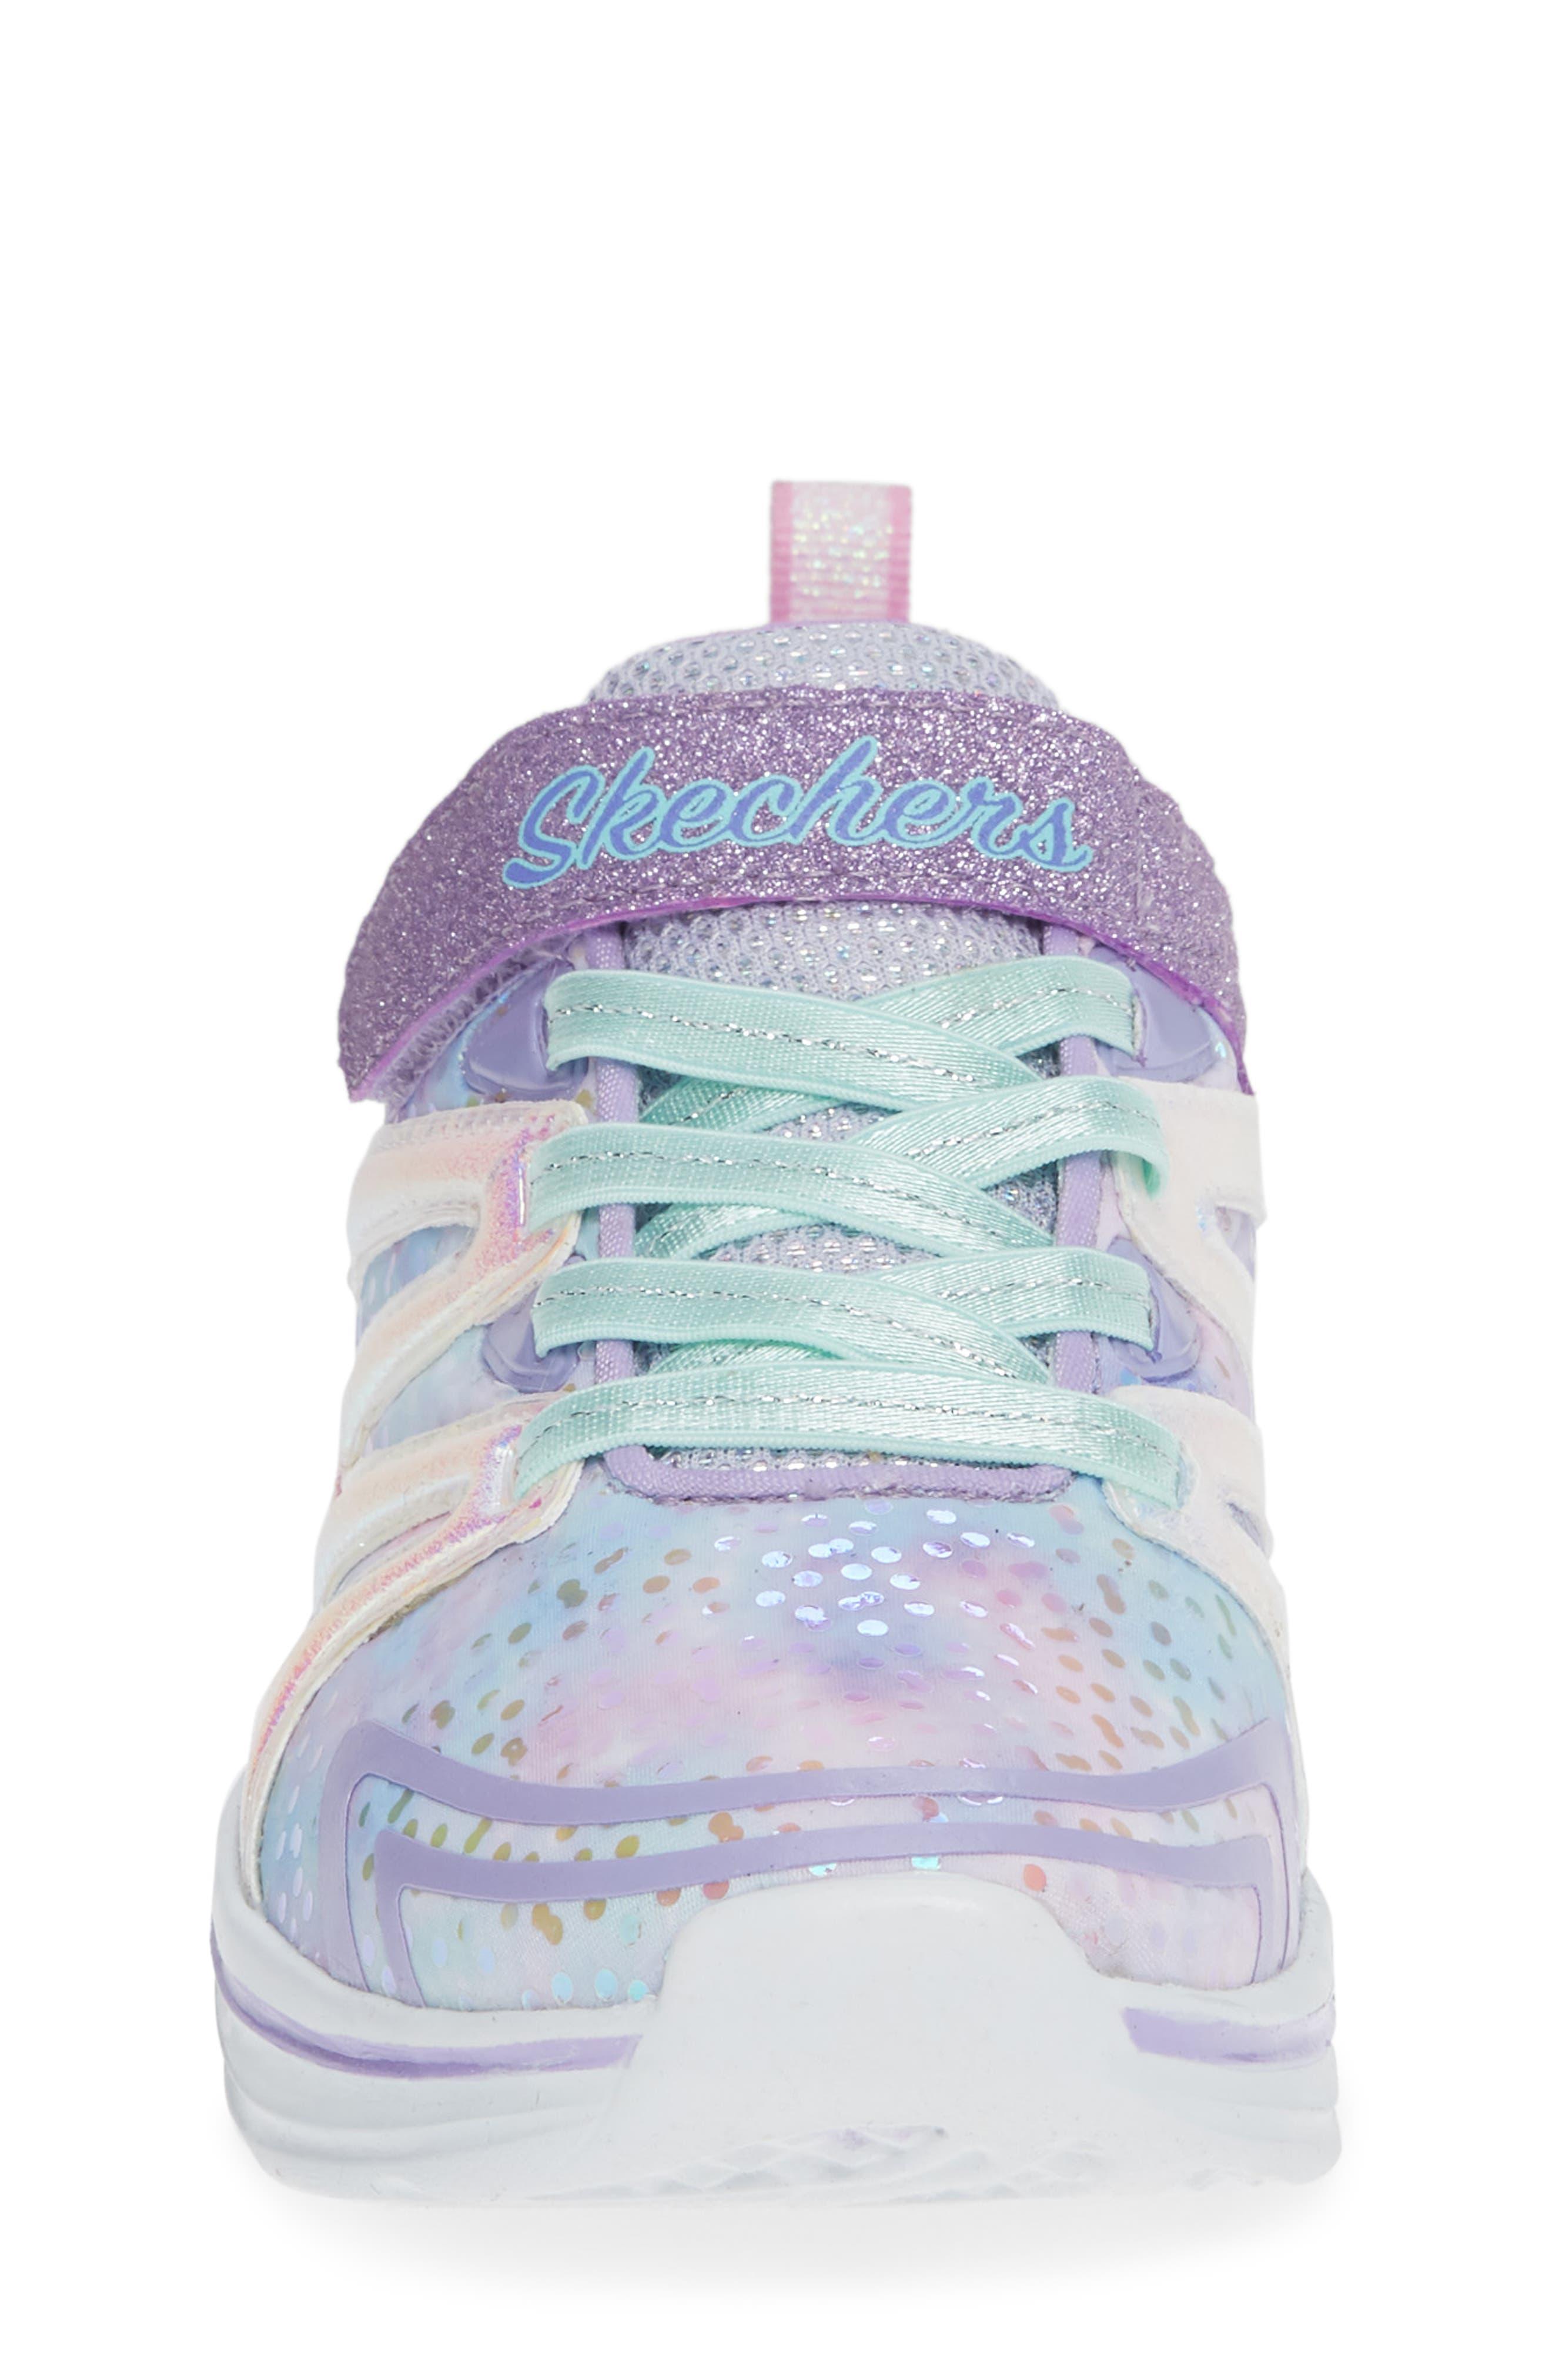 Double Dreams Shimmer Sneaker,                             Alternate thumbnail 4, color,                             LAVENDER/ MULTI